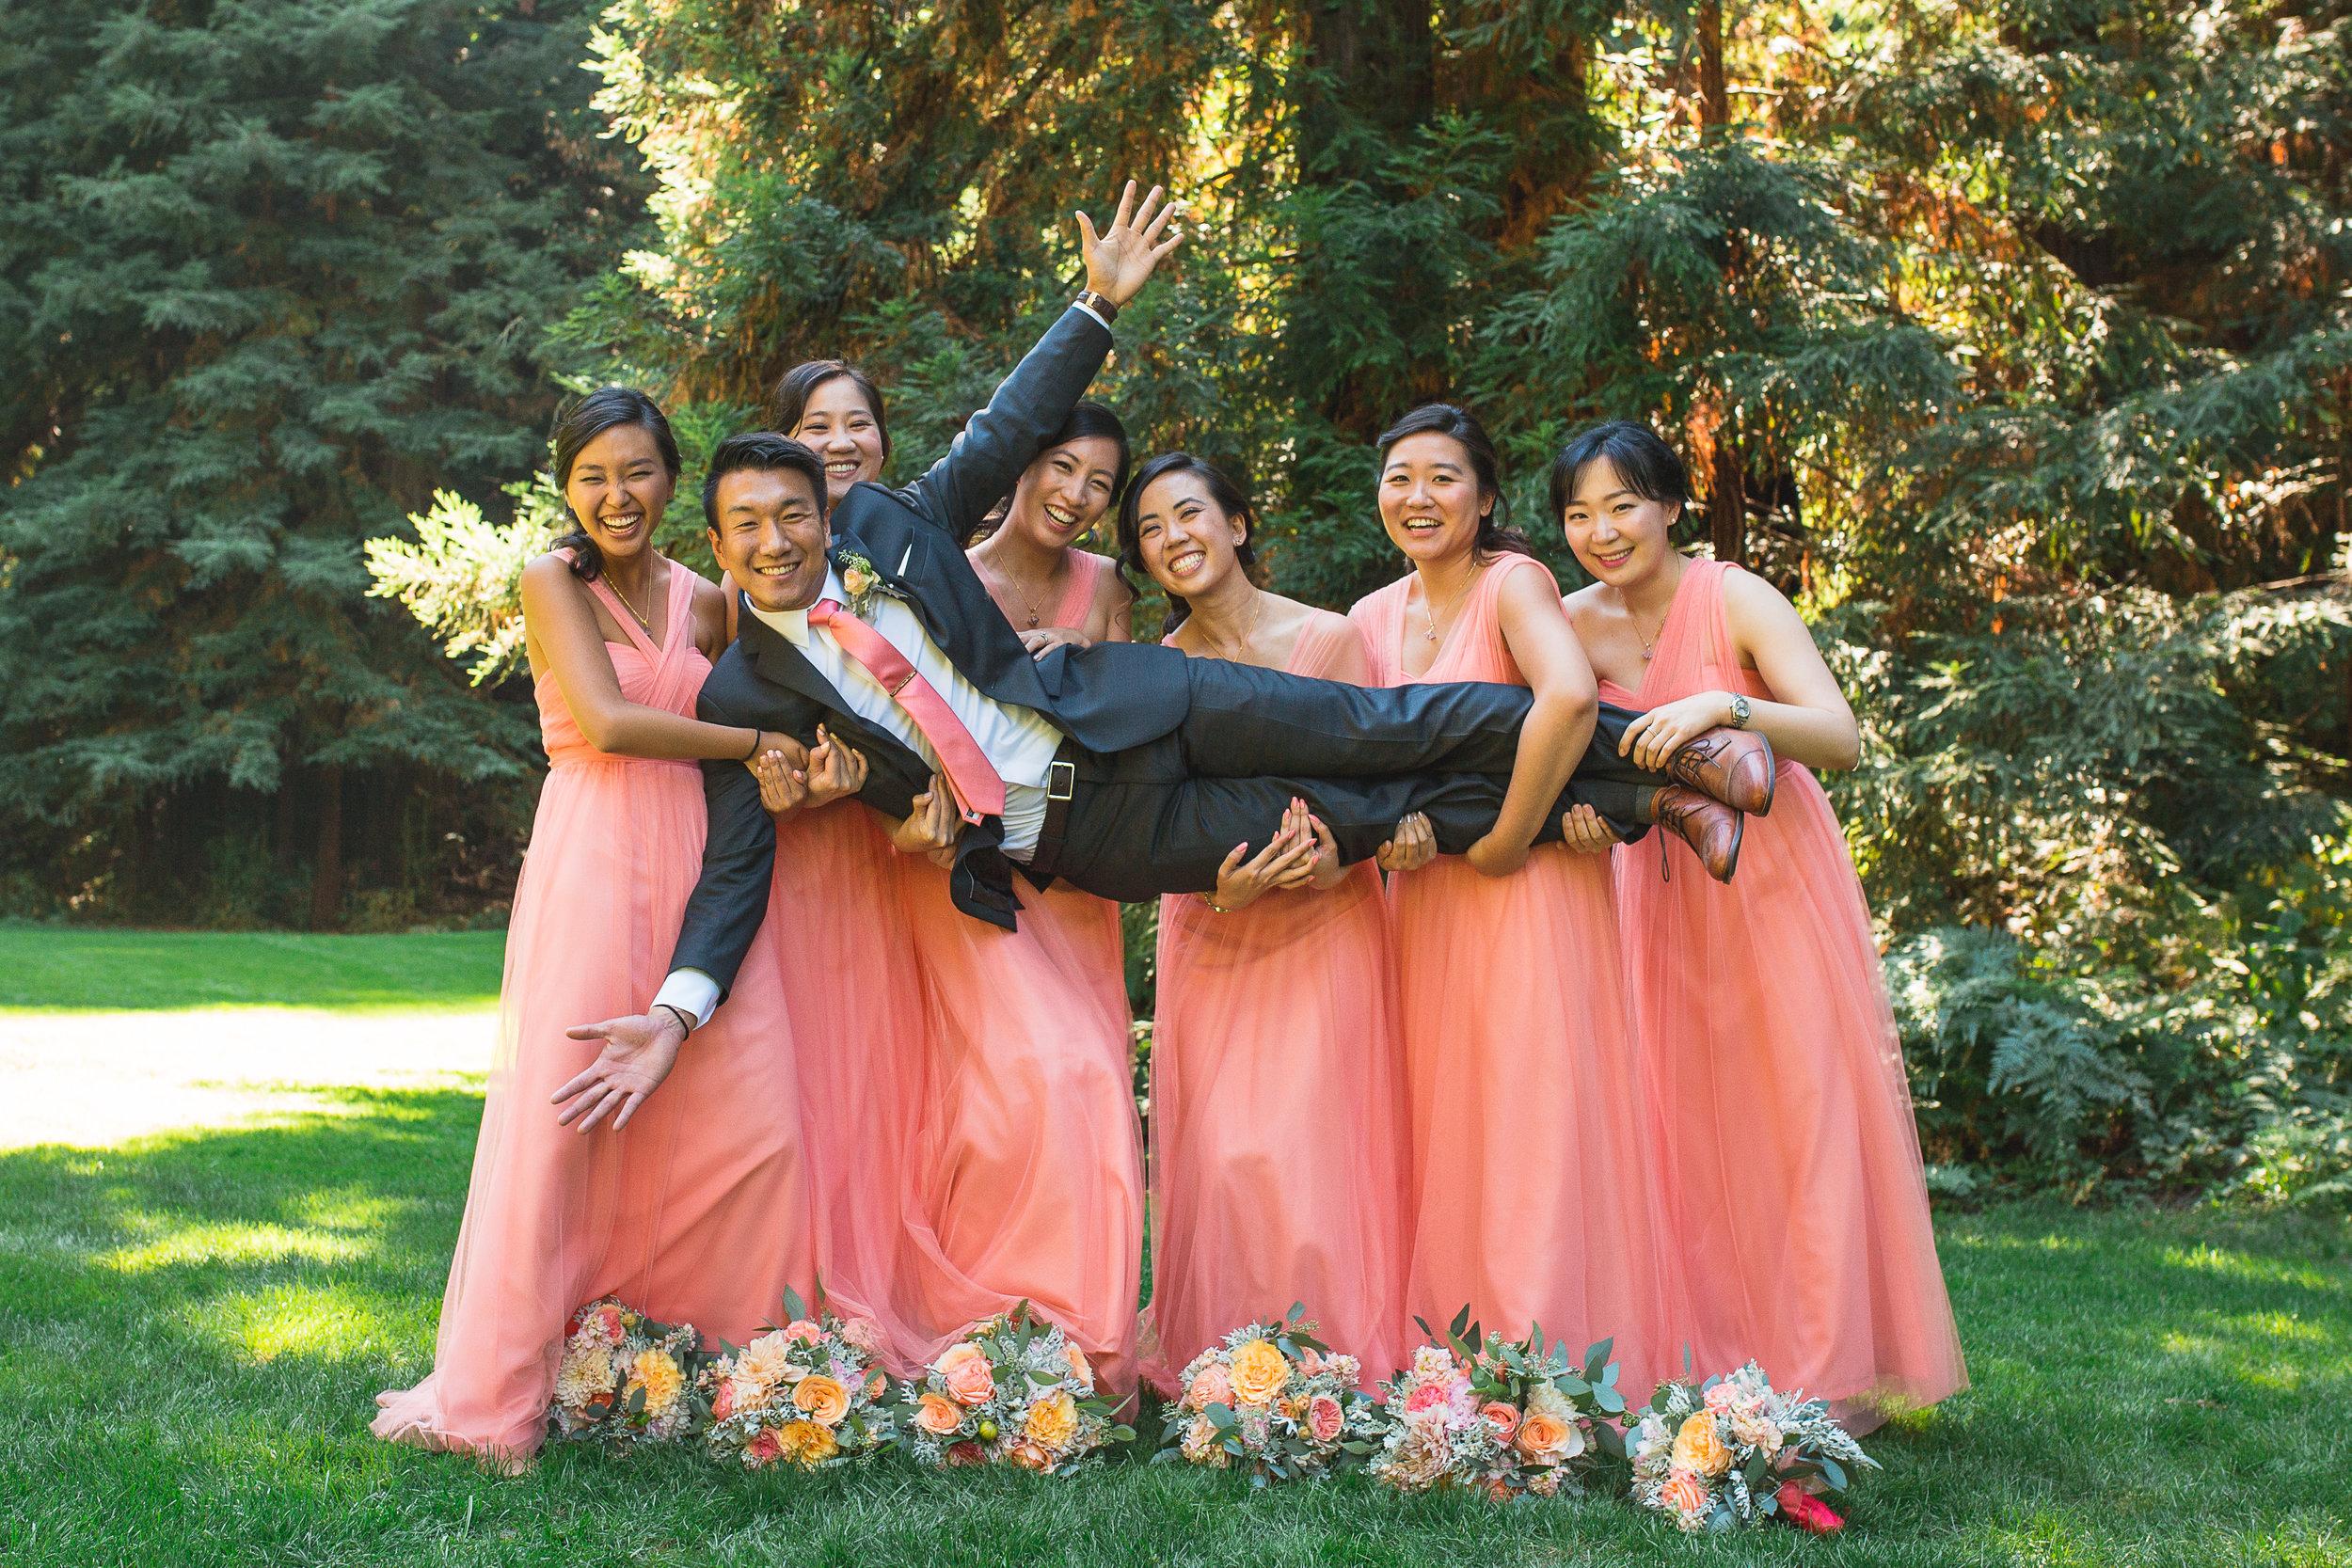 Brides win, haha